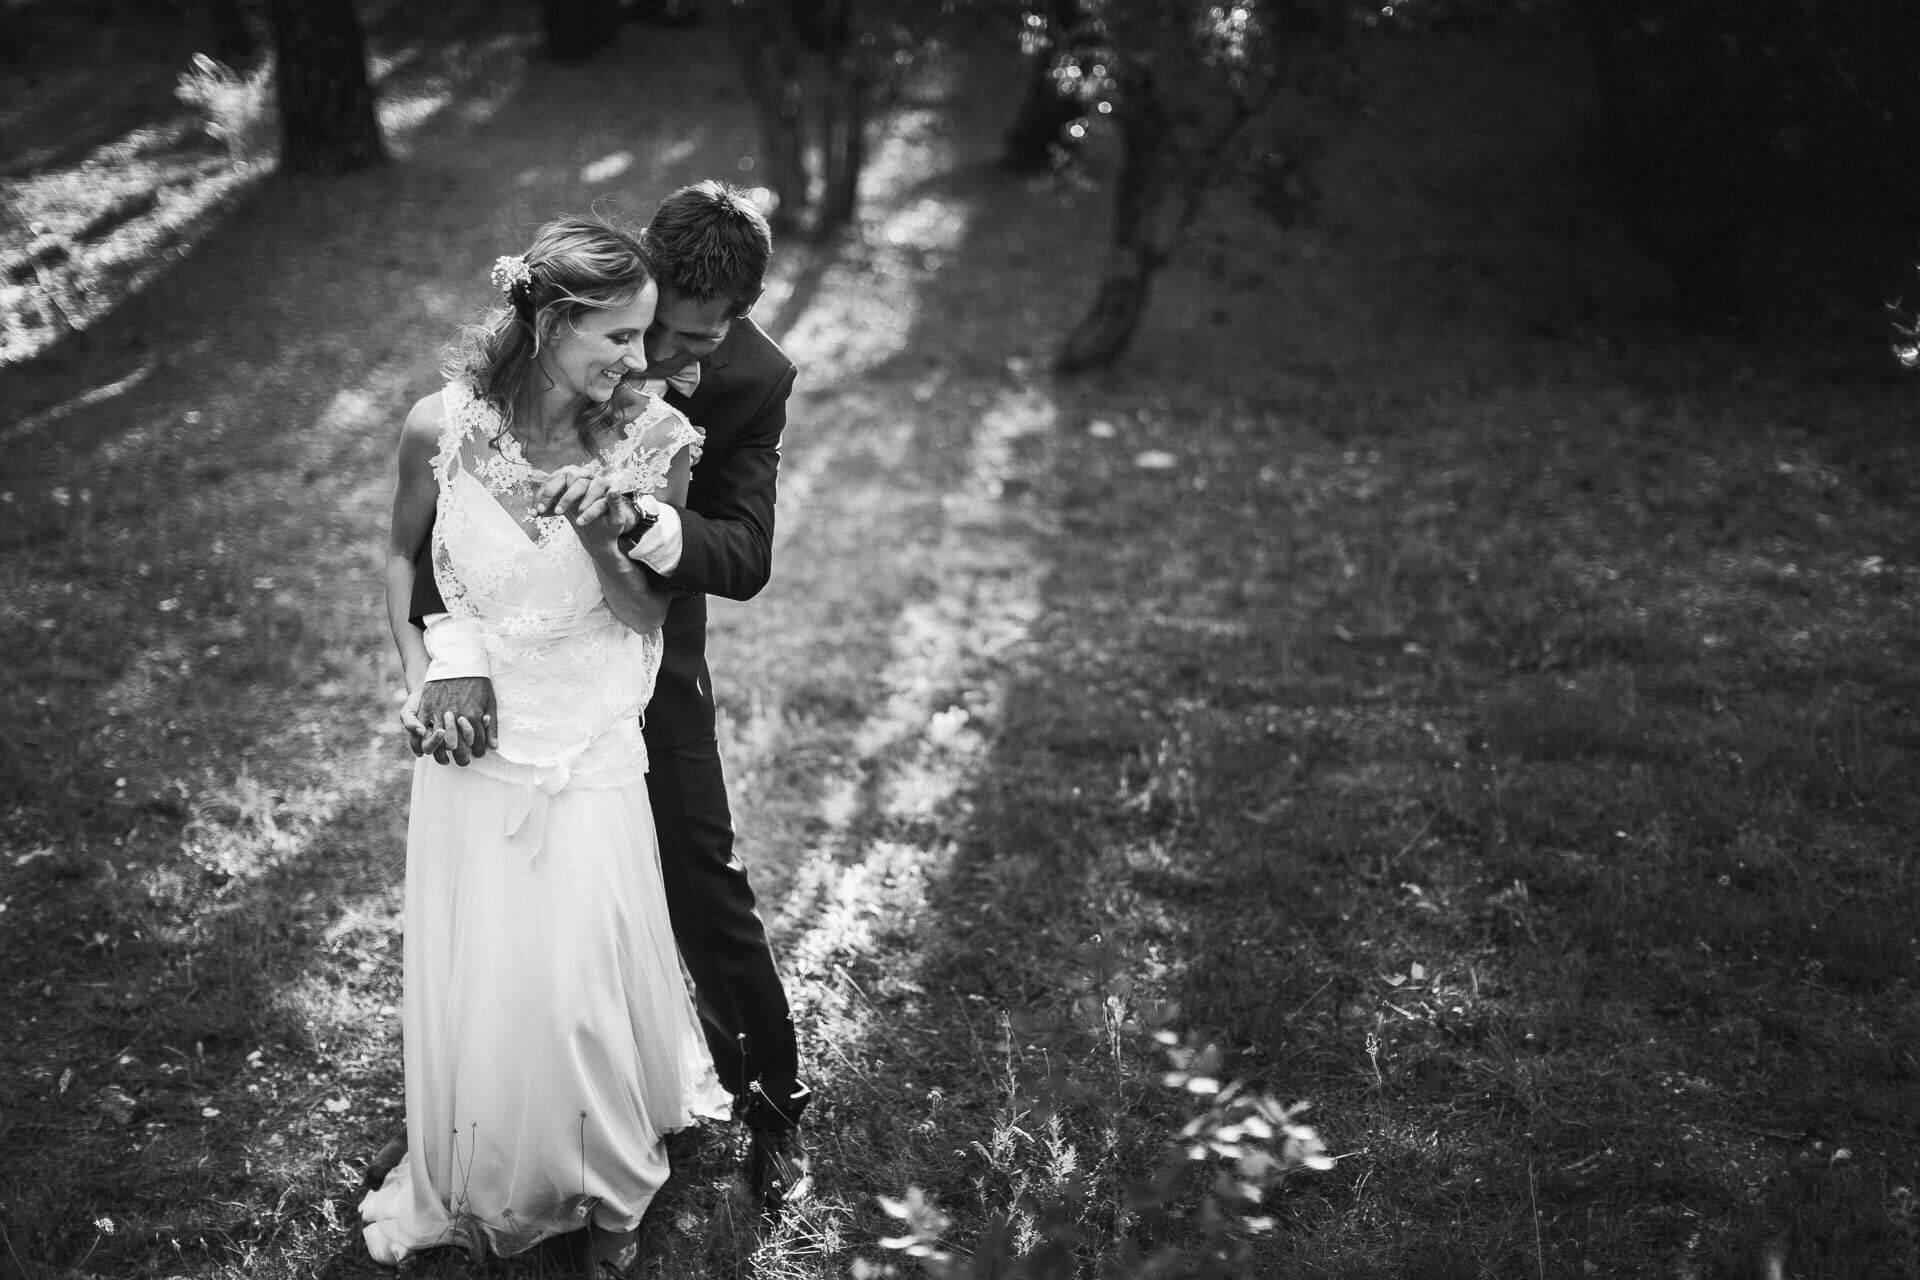 photographe-mariage-aix-en-provence-stephanie-jerome-23